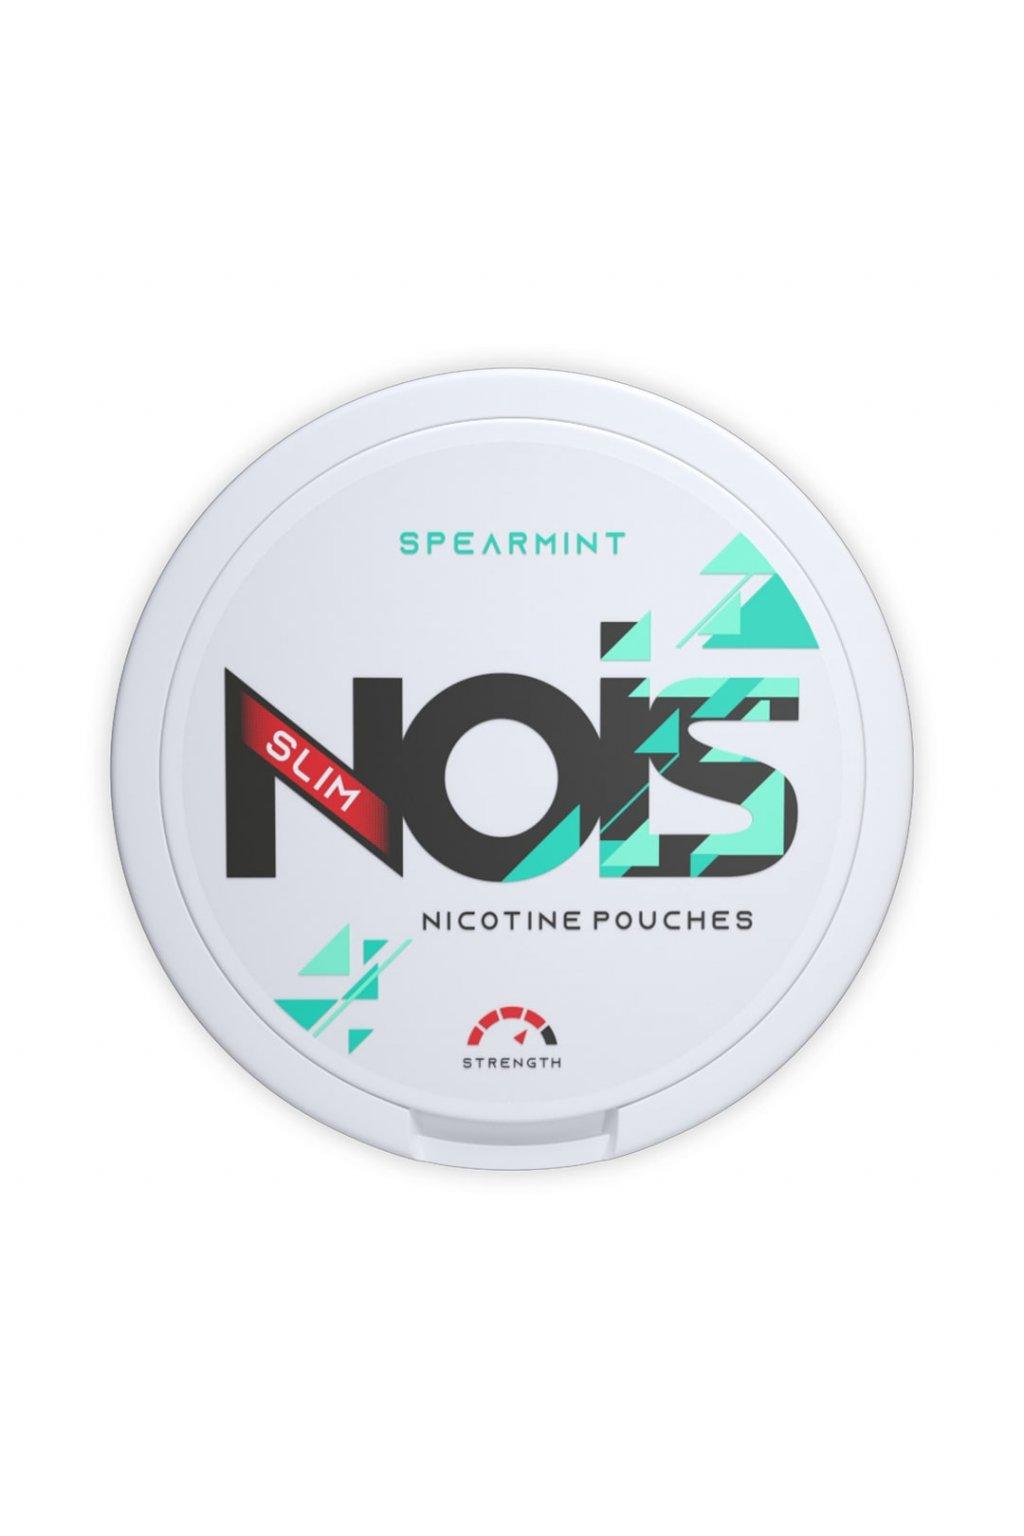 nois spearmint nikotinove sacky nicopods nordiction min